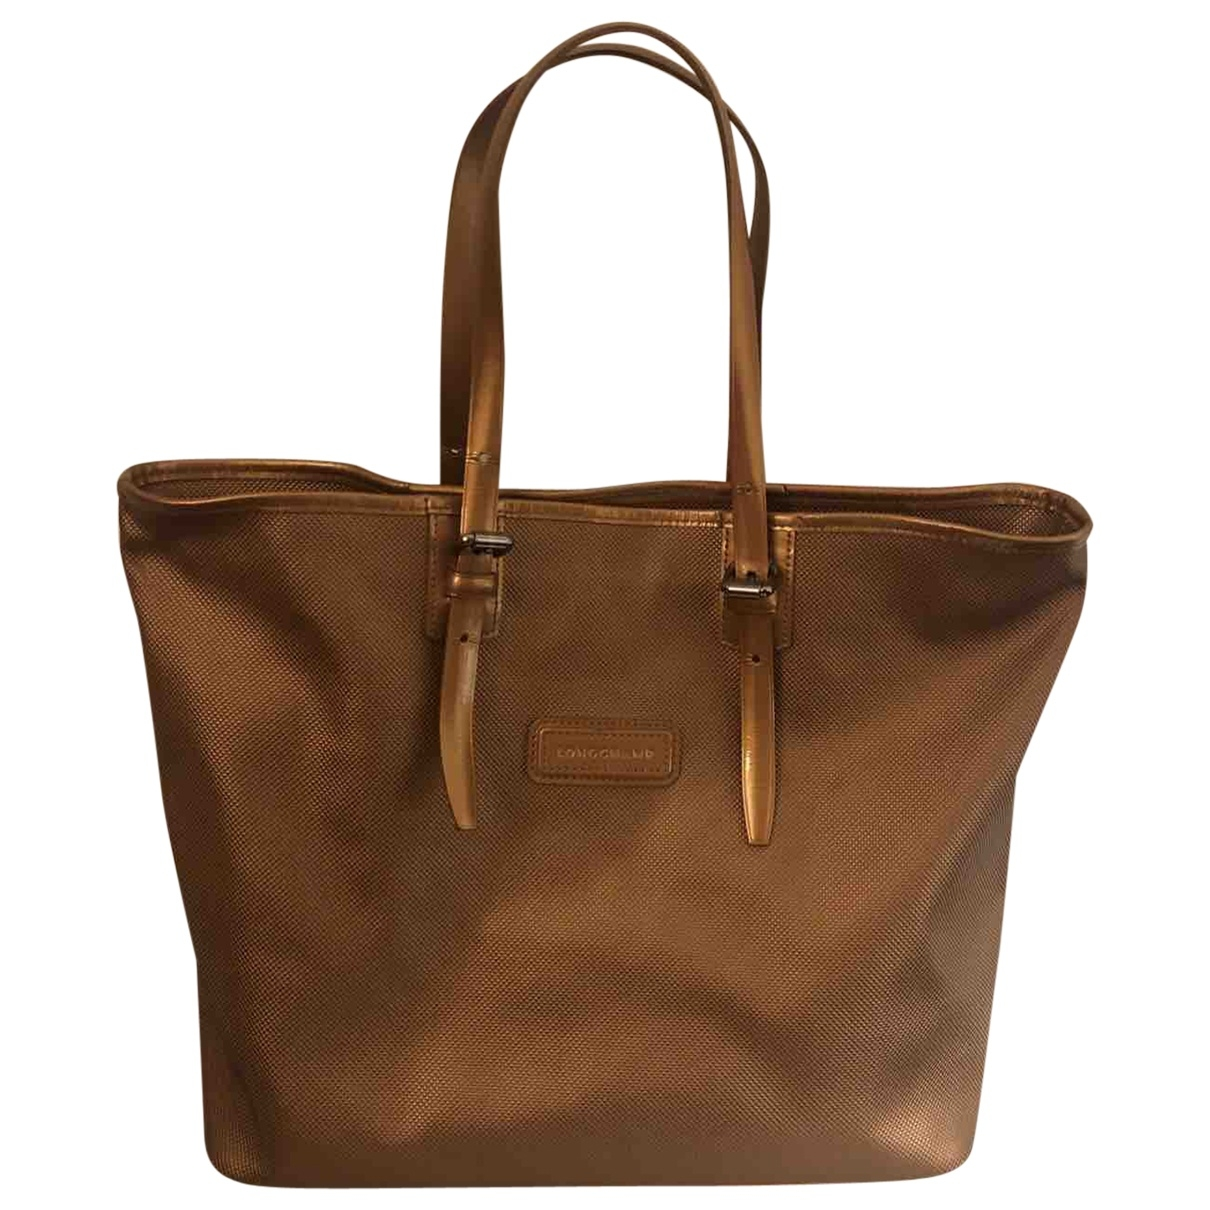 Longchamp \N Gold Cloth handbag for Women \N